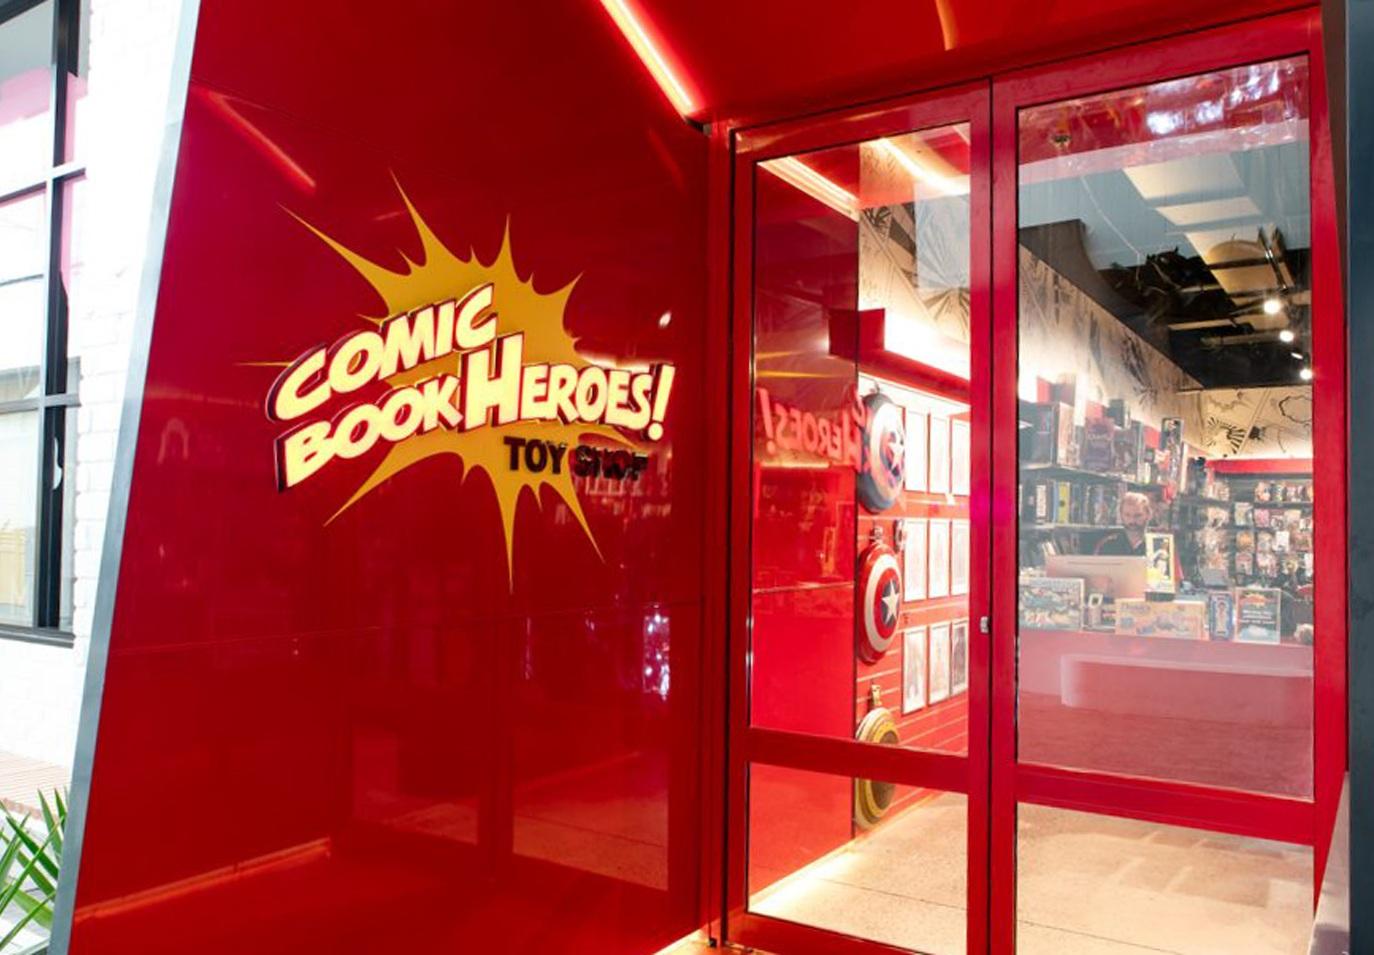 ComicBookHeroesEntry